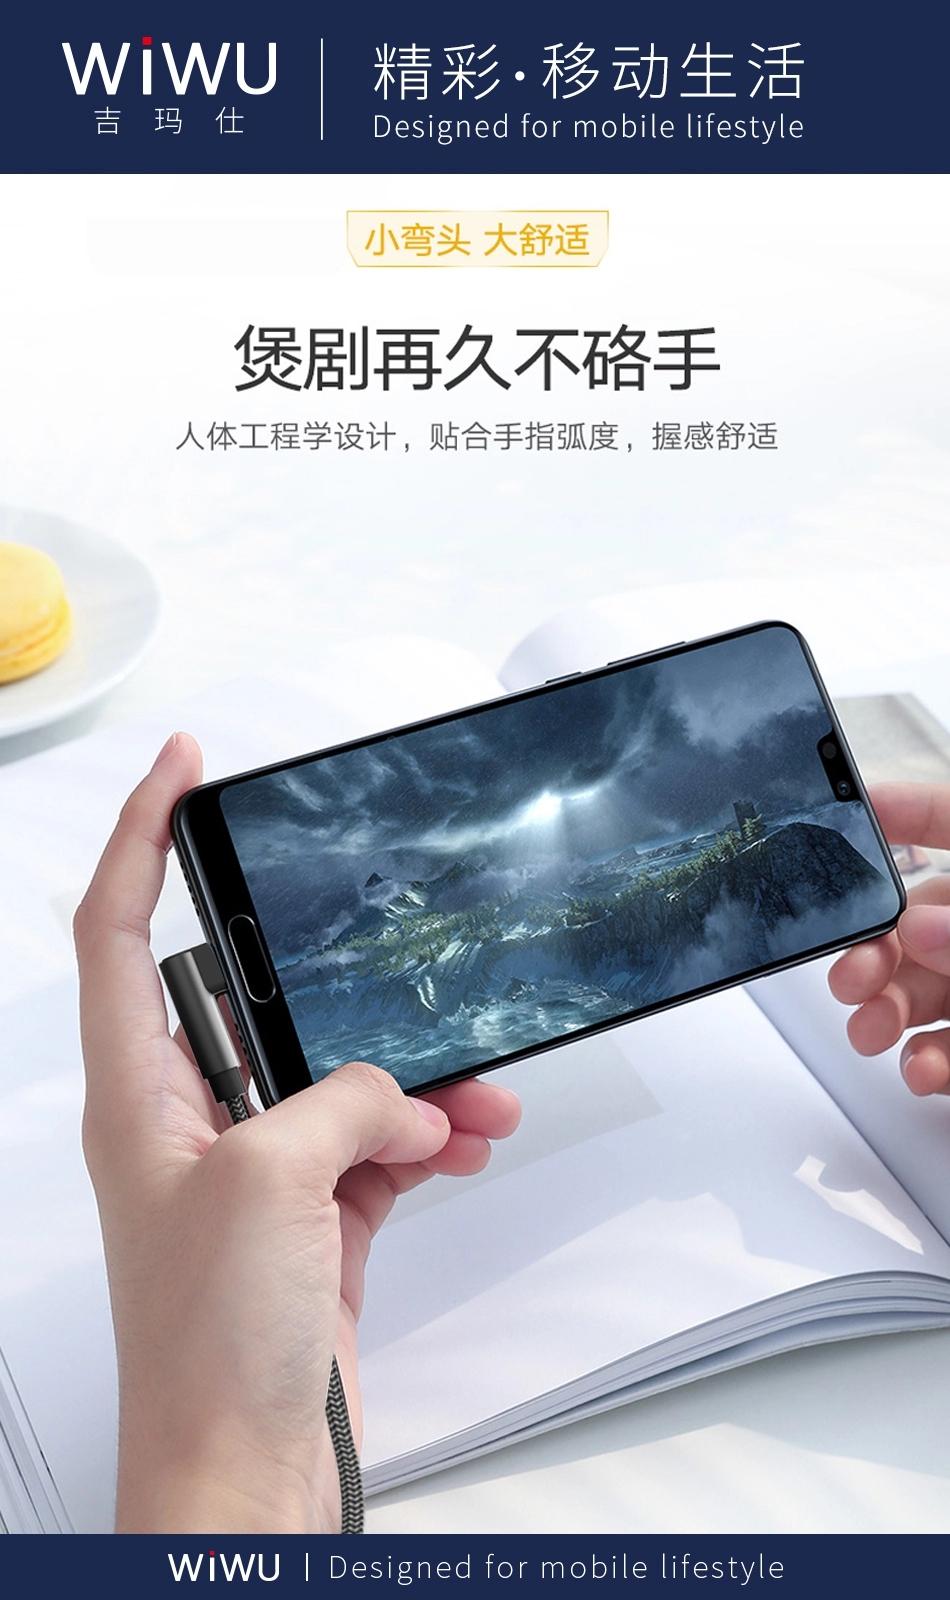 WIWU 苹果HDMI视频输出数据线 (https://www.wiwu.net.cn/) 数据线 第3张